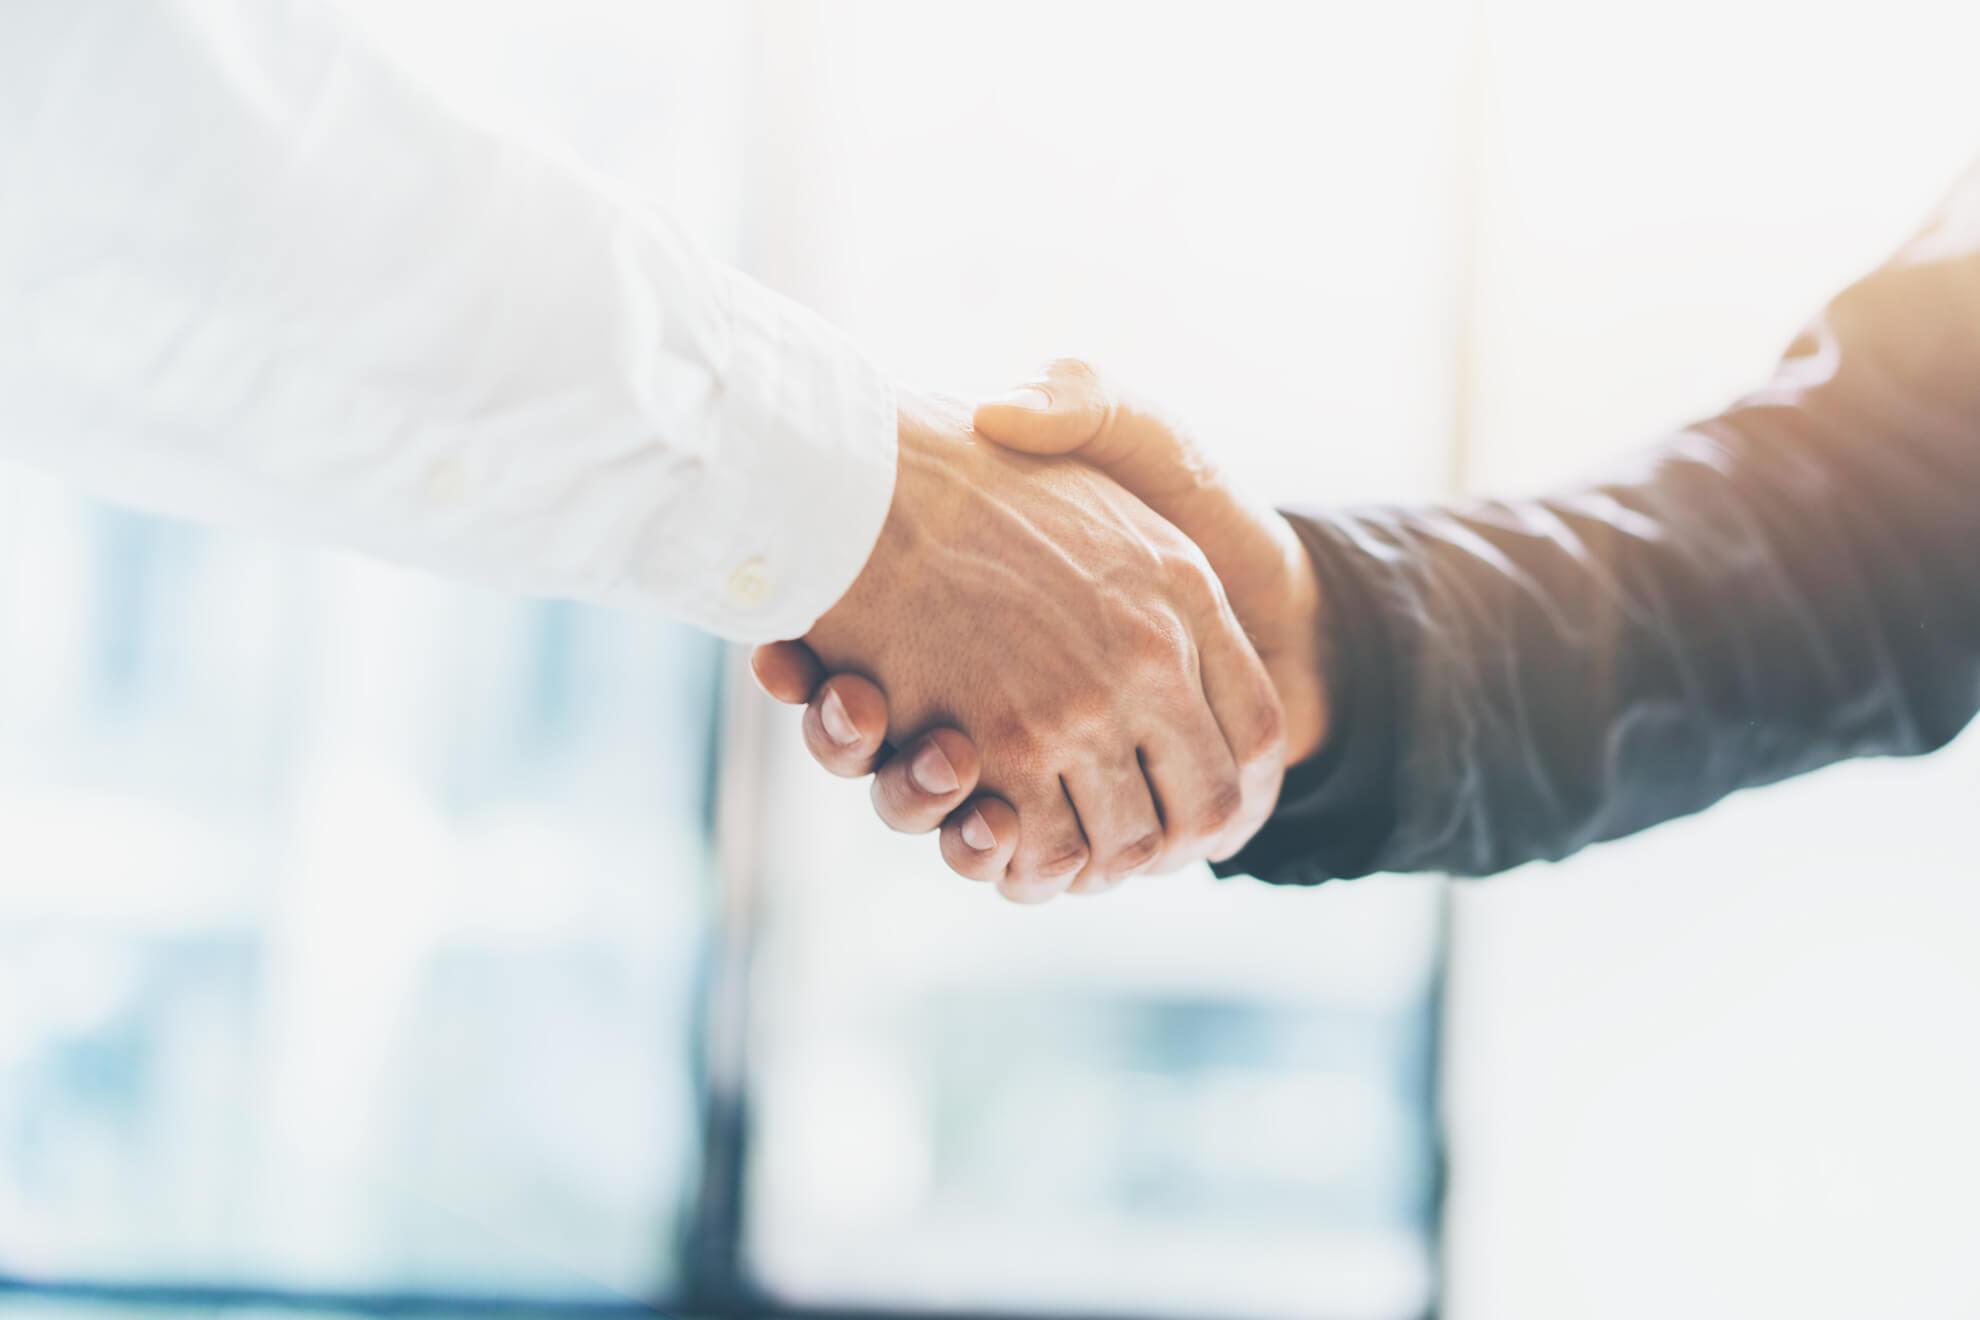 Cambridge Immigration, Work Visa, Skilled Worker, Employer, Shake hands